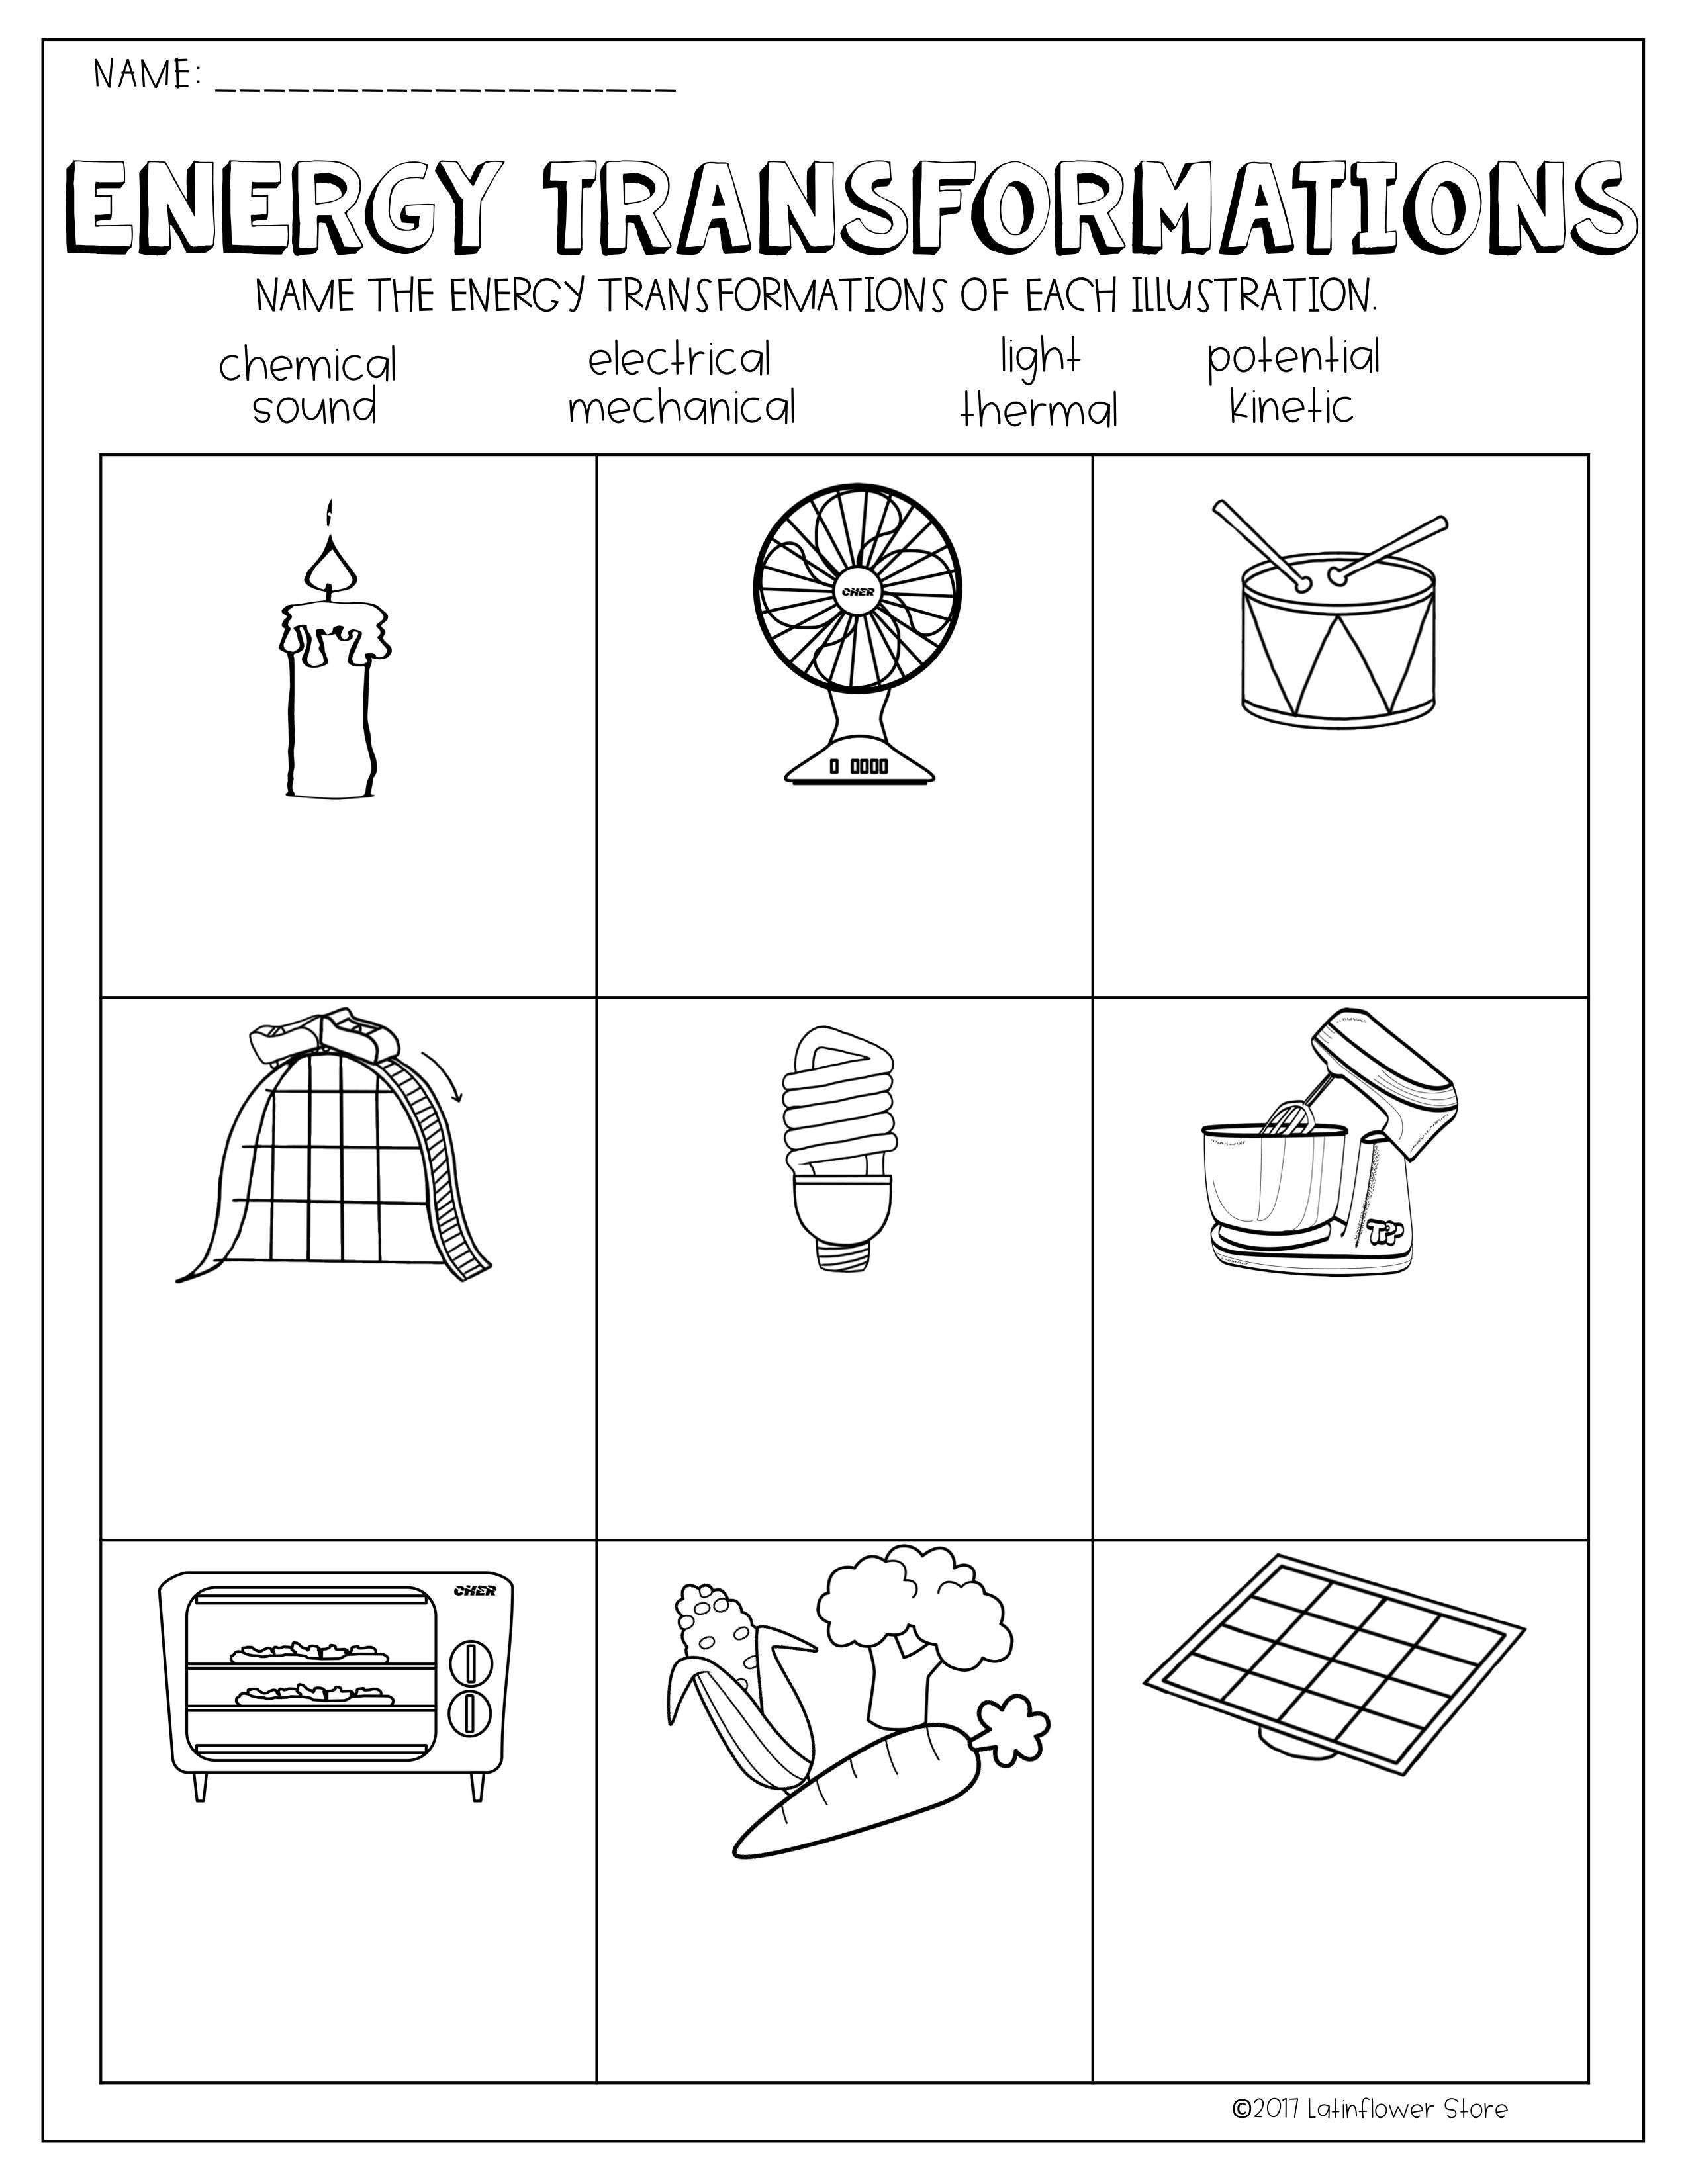 Worksheets Energy Transformation Worksheet Answers energy transformations worksheet worksheets science classroom worksheet